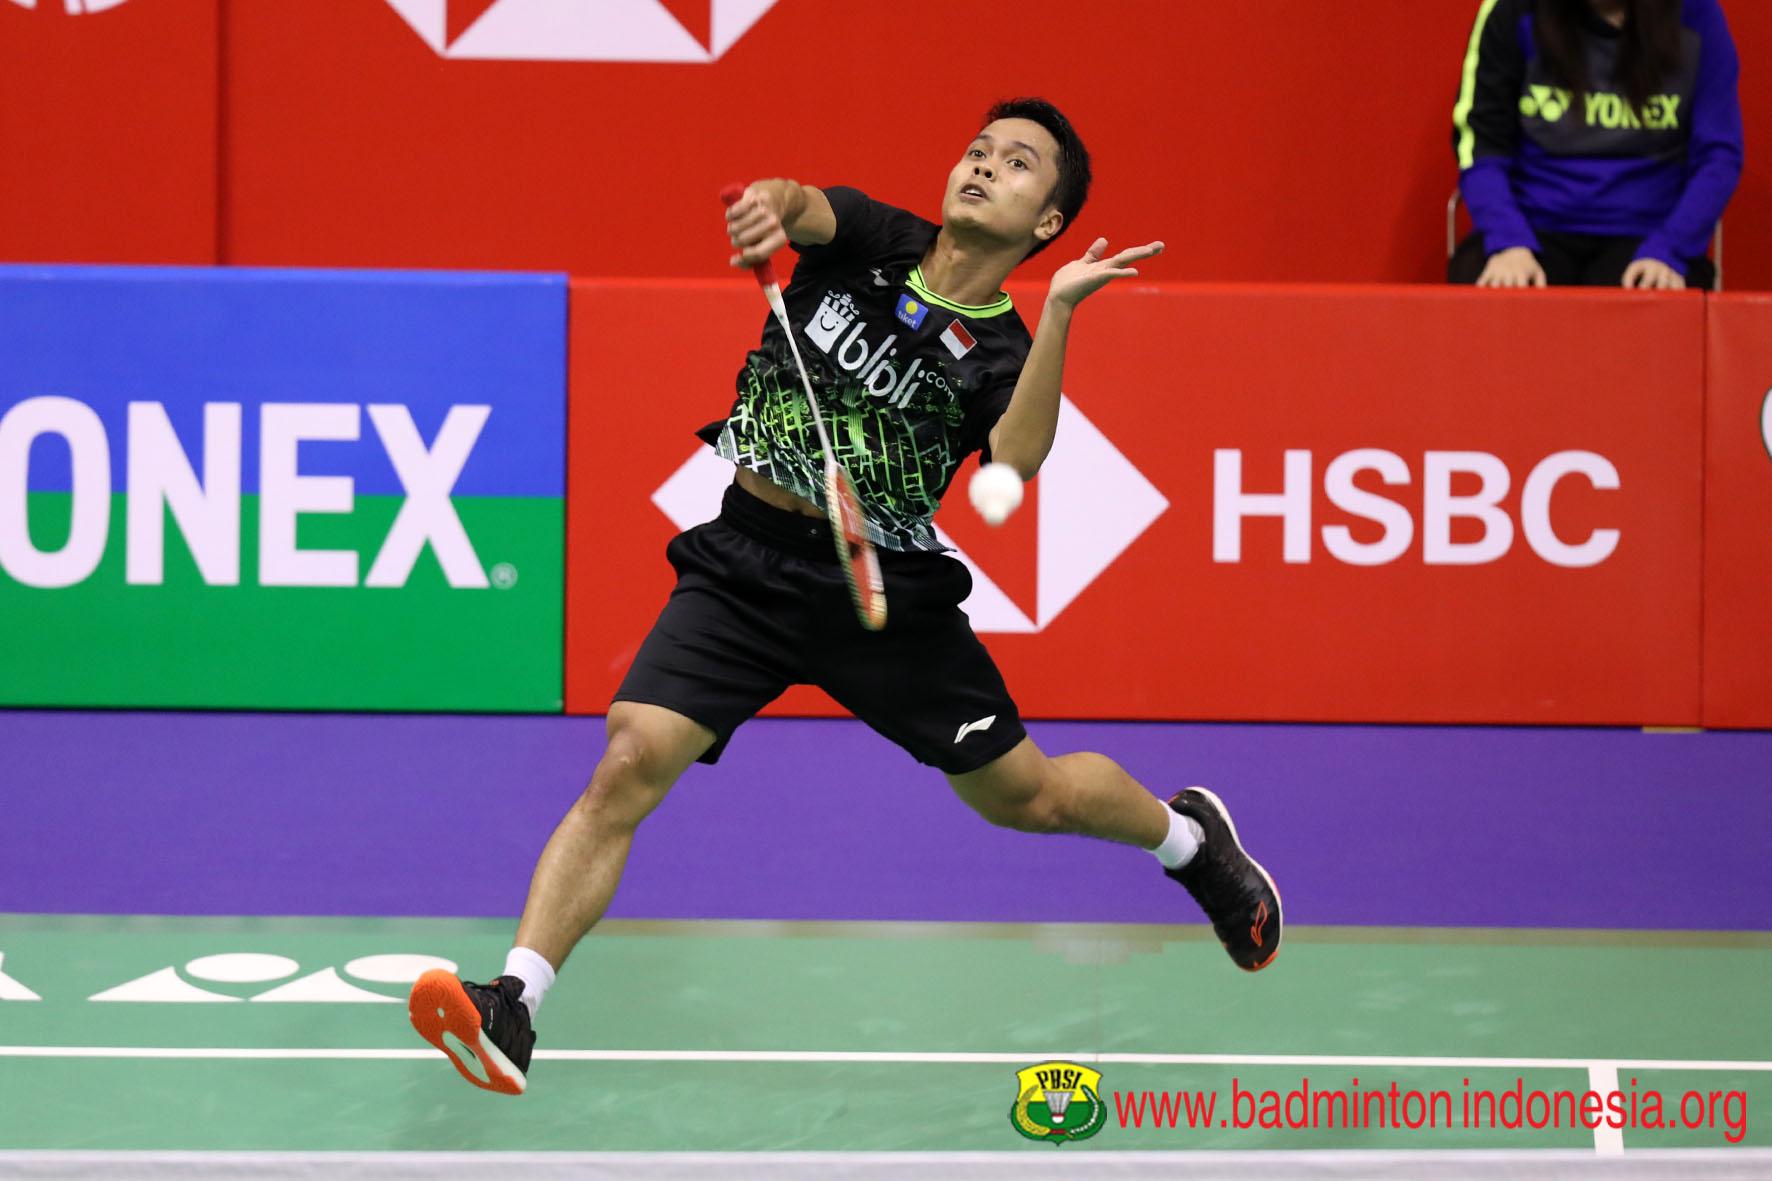 https: img-z.okeinfo.net content 2019 11 17 40 2130845 jadwal-wakil-indonesia-di-final-hong-kong-open-2019-YsyJzXfvK0.jpg